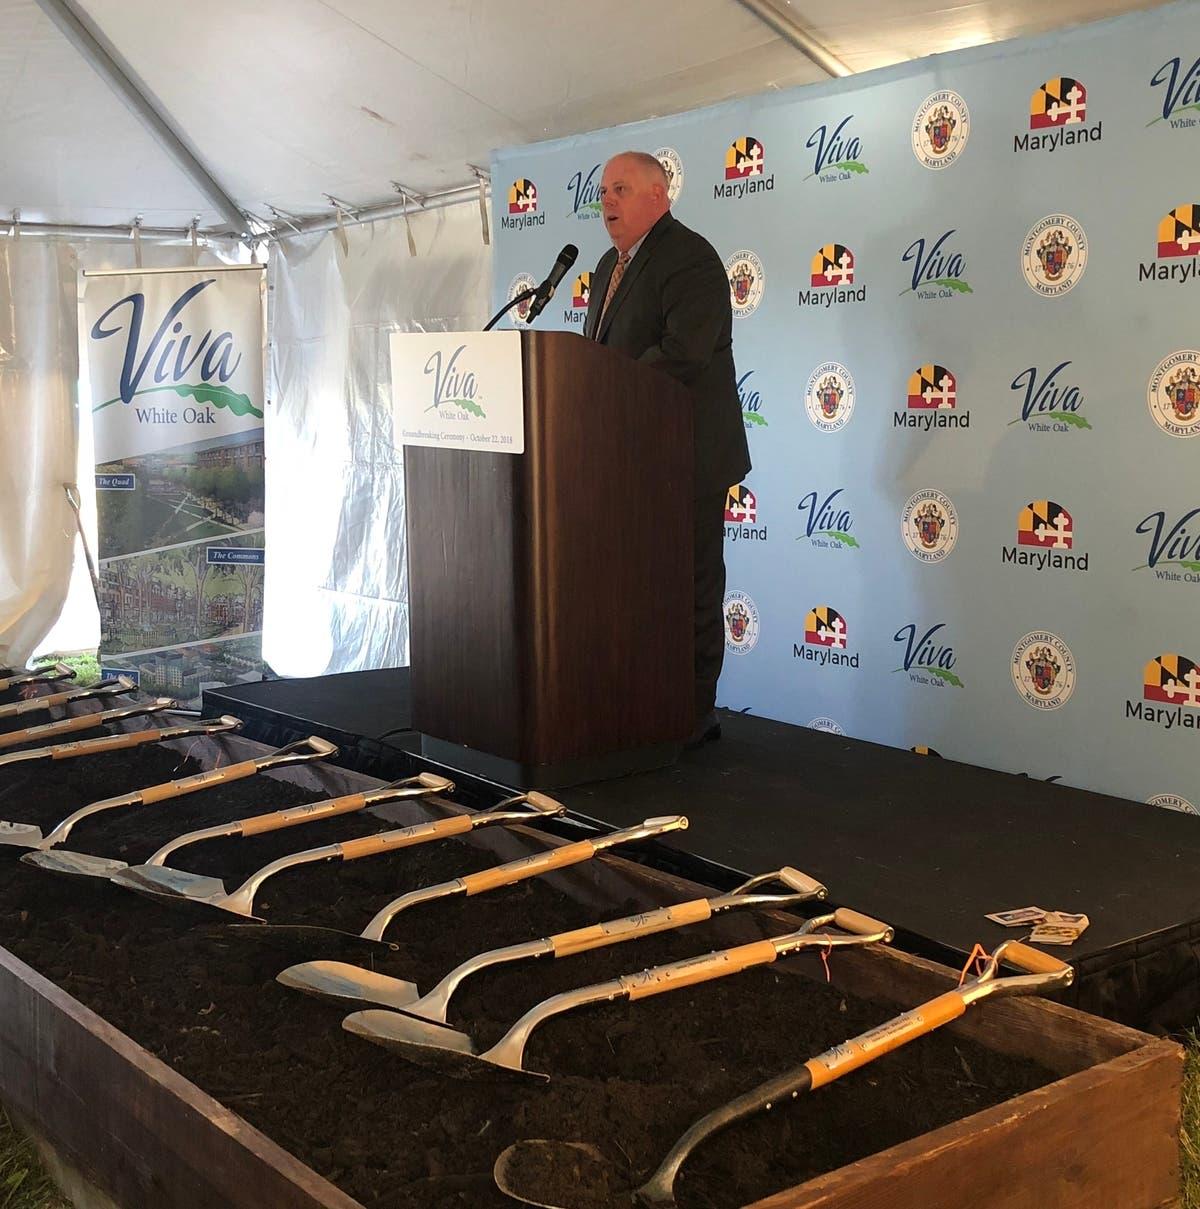 White Oak Maryland: Gov. Hogan, Officials Lead VIVA White Oak Groundbreaking